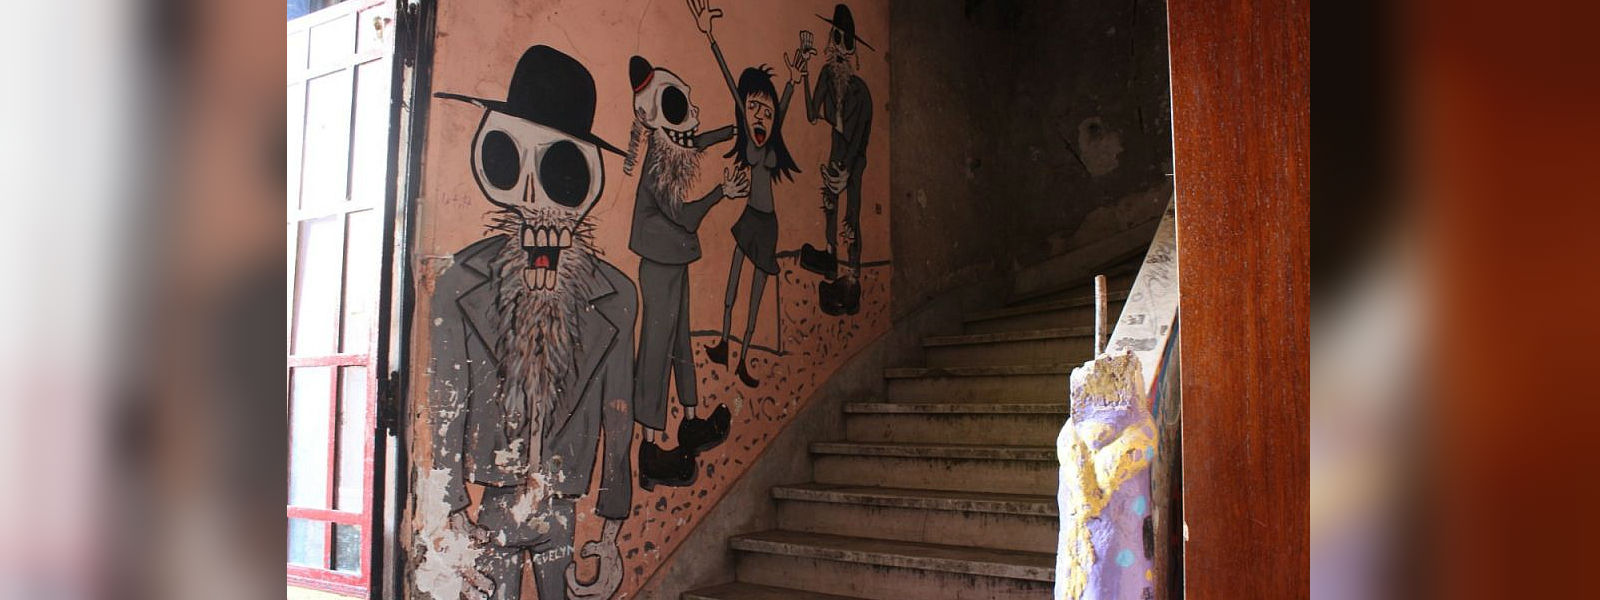 Argentine mural builds ties across border, breaks world record